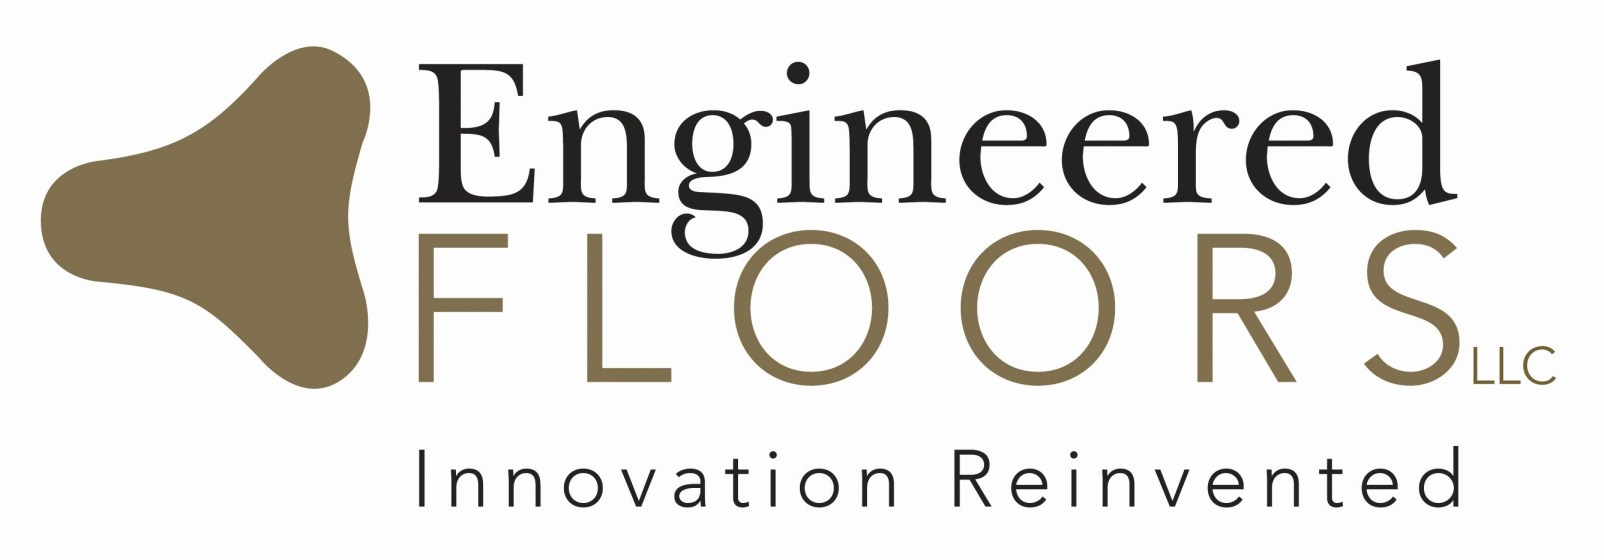 Pharmacy Lamps Restoration Hardware Engineered Floors Llc - Engineered Floors Llc ...